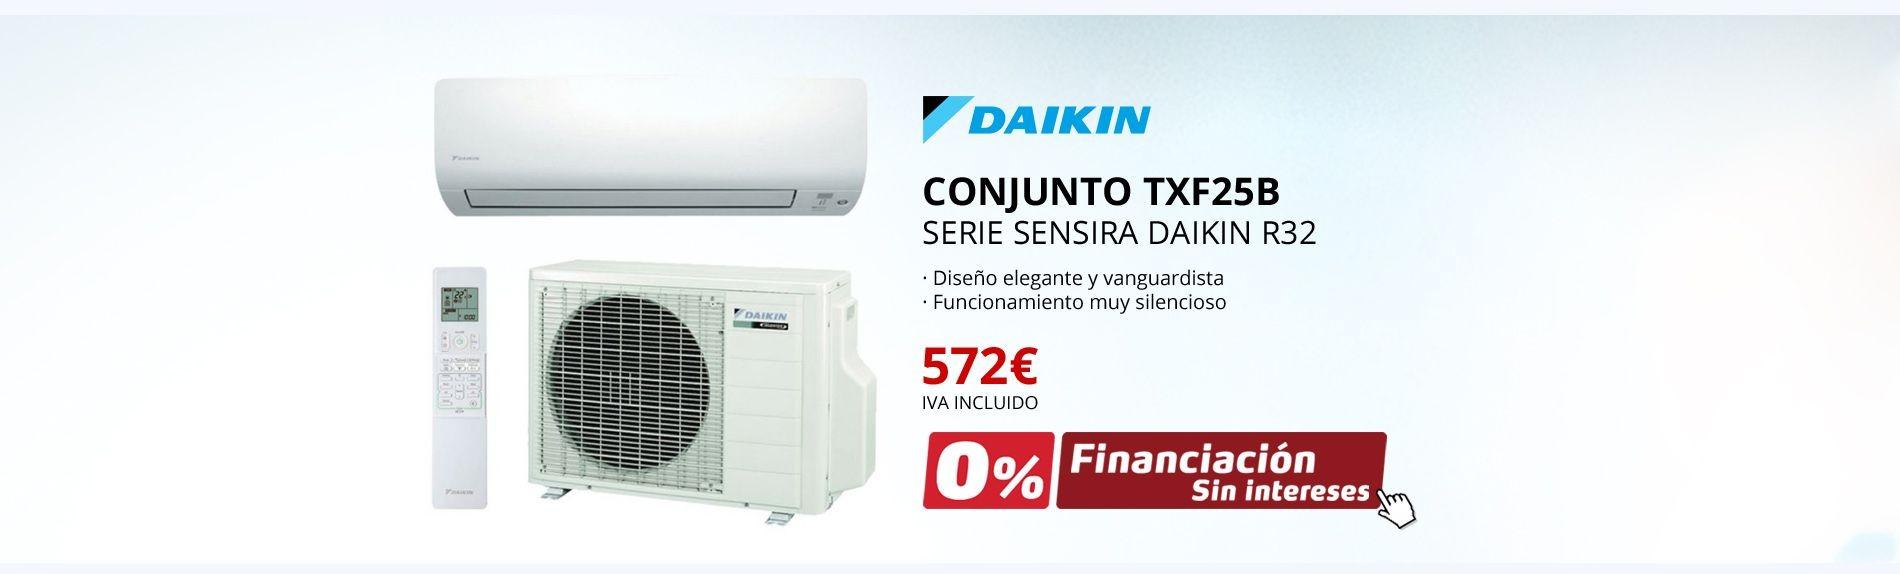 CONJUNTO TXF25B - SERIE SENSIRA DAIKIN R32